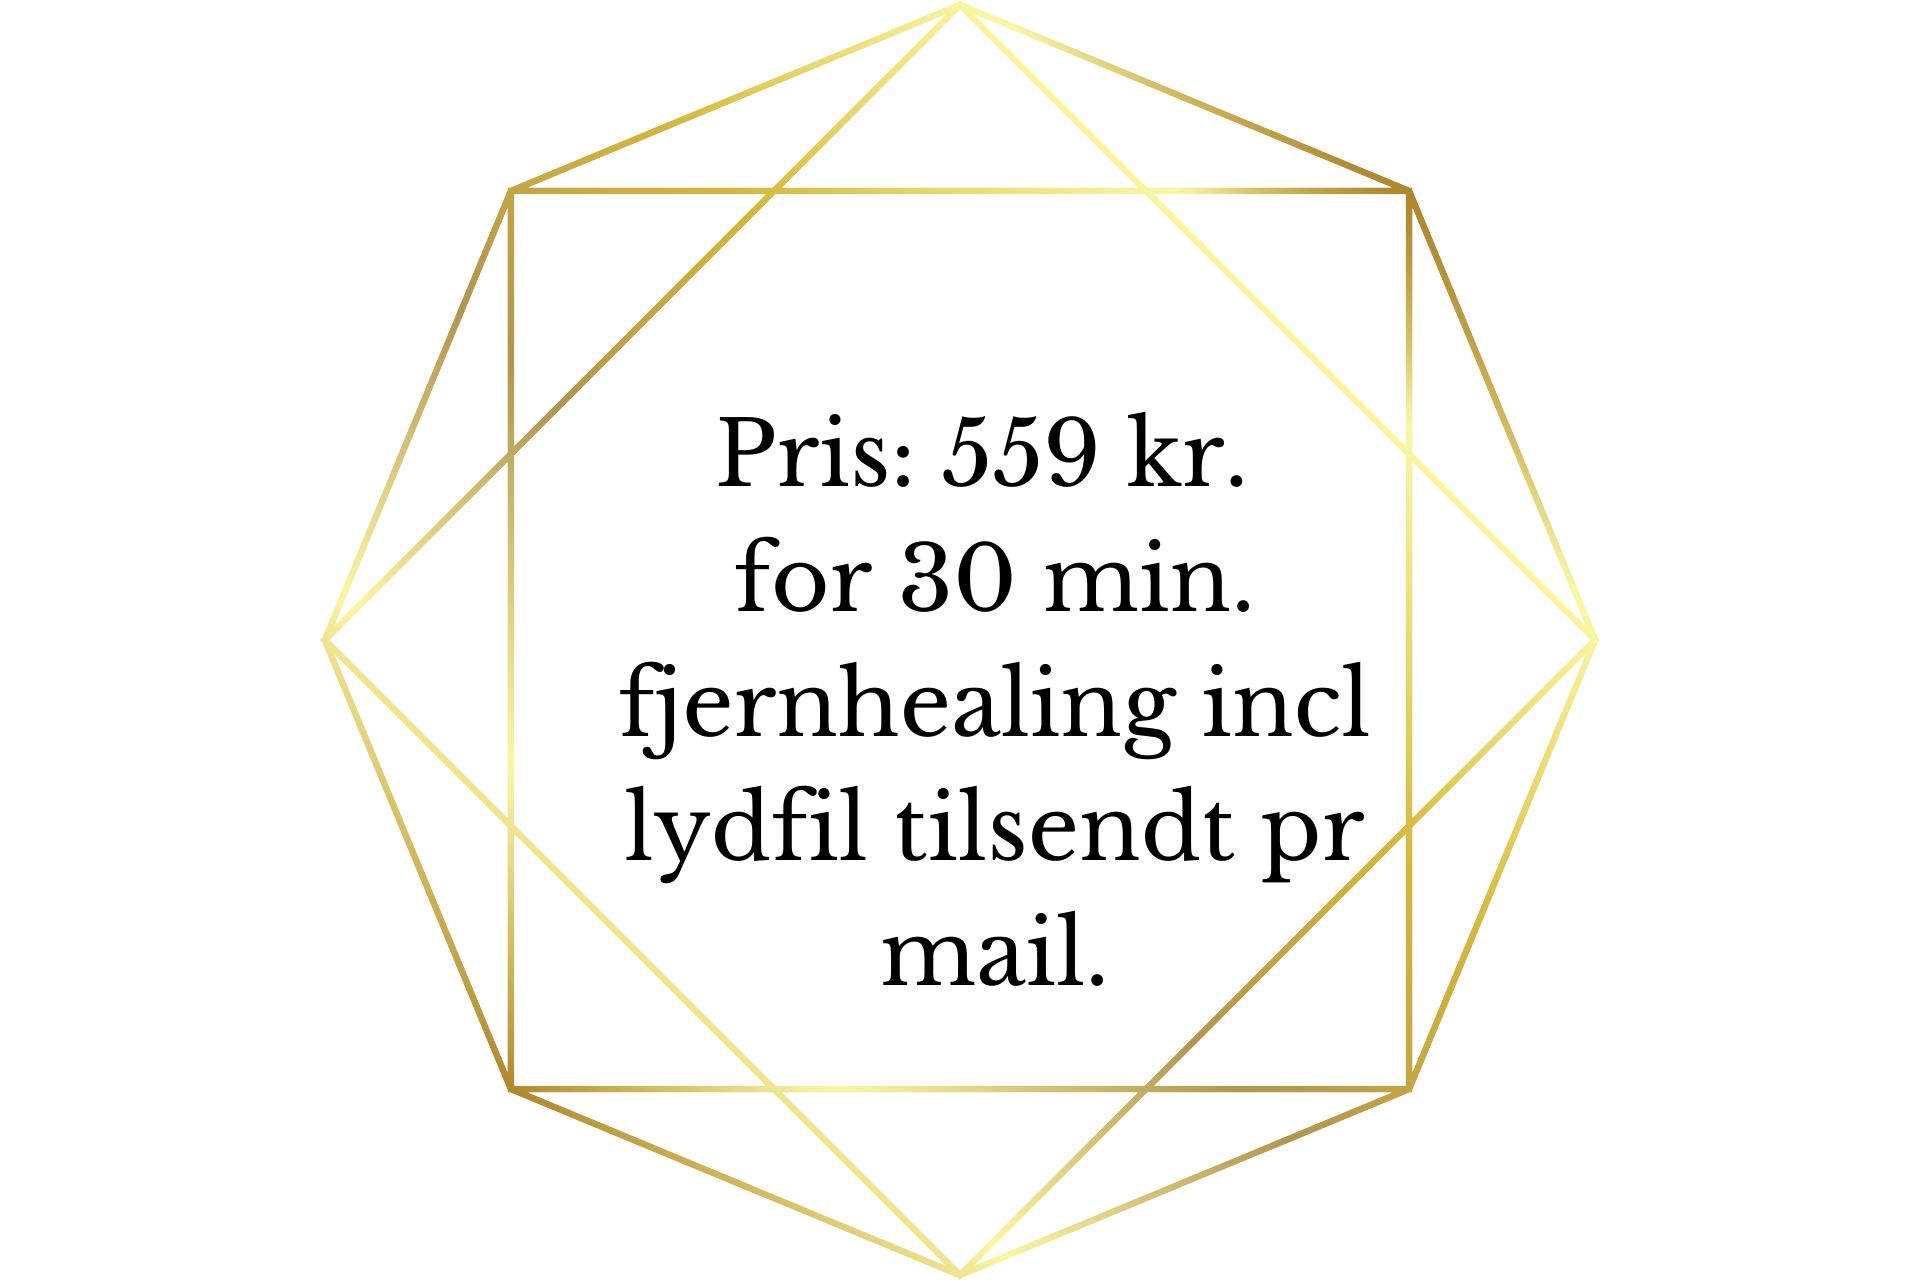 Pris 775 kr. for 60 minutters online samtale via tlf.skypemessenger. (3)